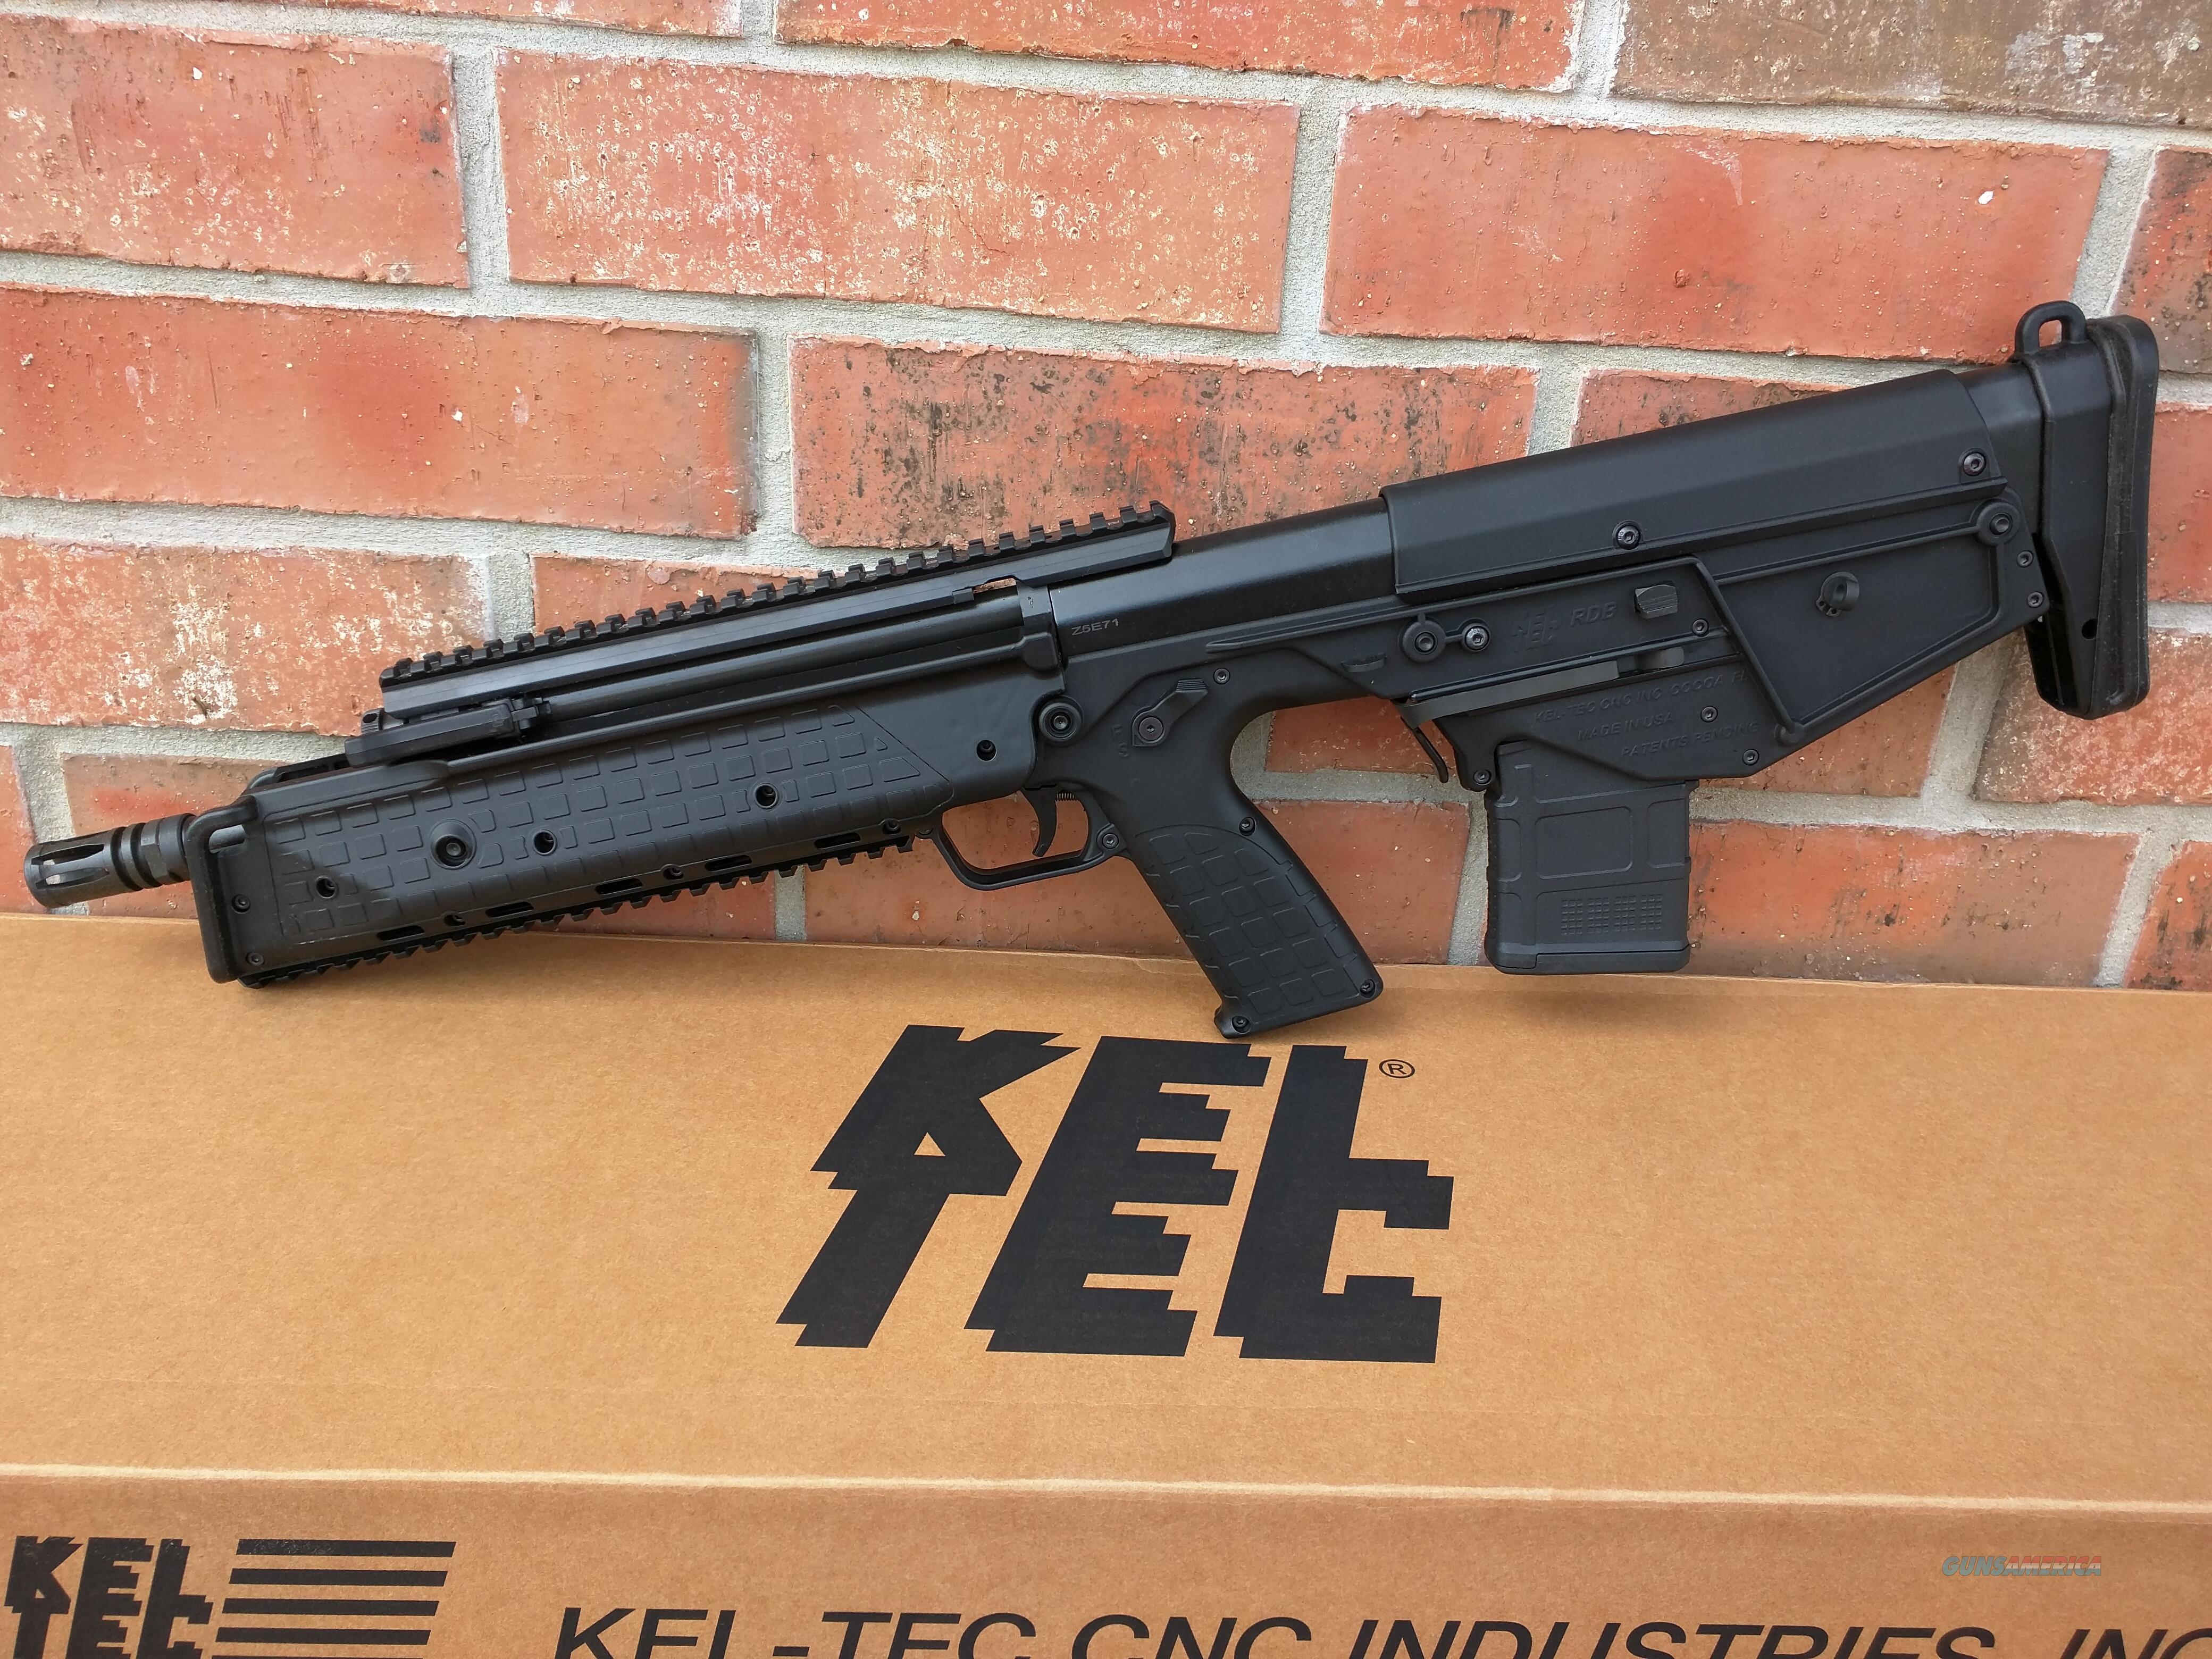 Kel Tec Keltec RDB Rifle 5.56 1-20 rd mag, takes all standard AR 15 mags FREE LAYAWAY  Guns > Rifles > Kel-Tec Rifles